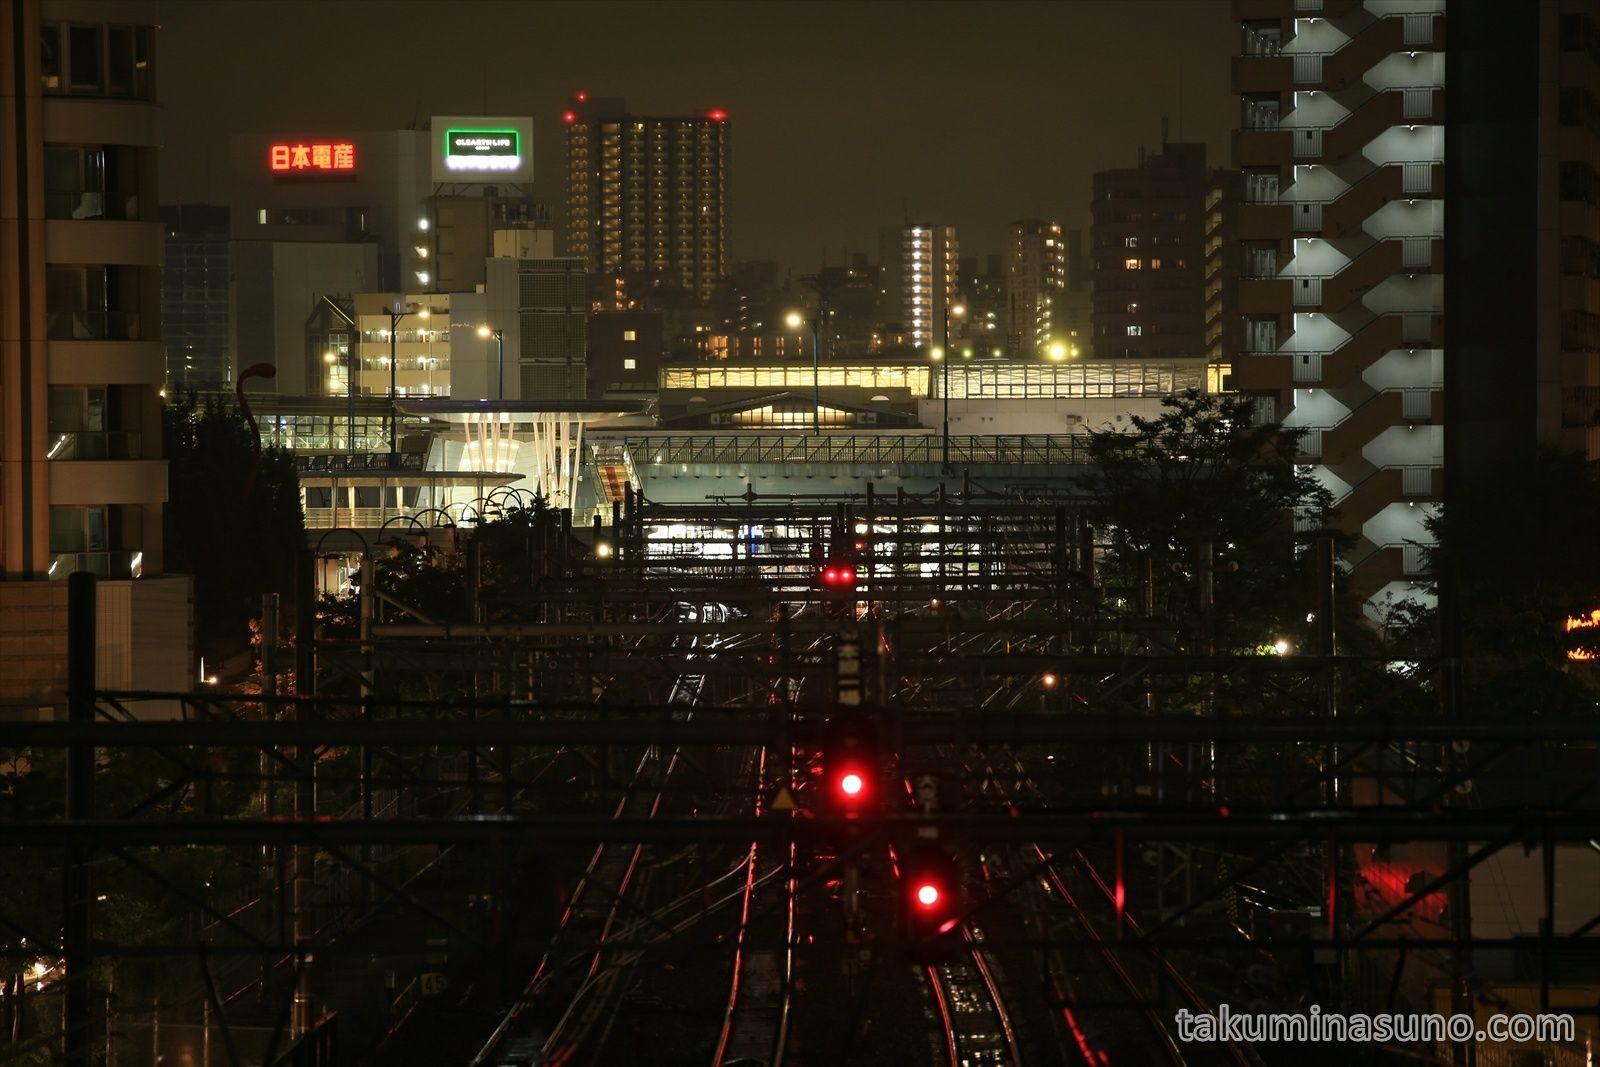 Railscape of Gotanda TN Lab by Takumi Nasuno http://takuminasuno.com/20140901_railscape-of-gotanda